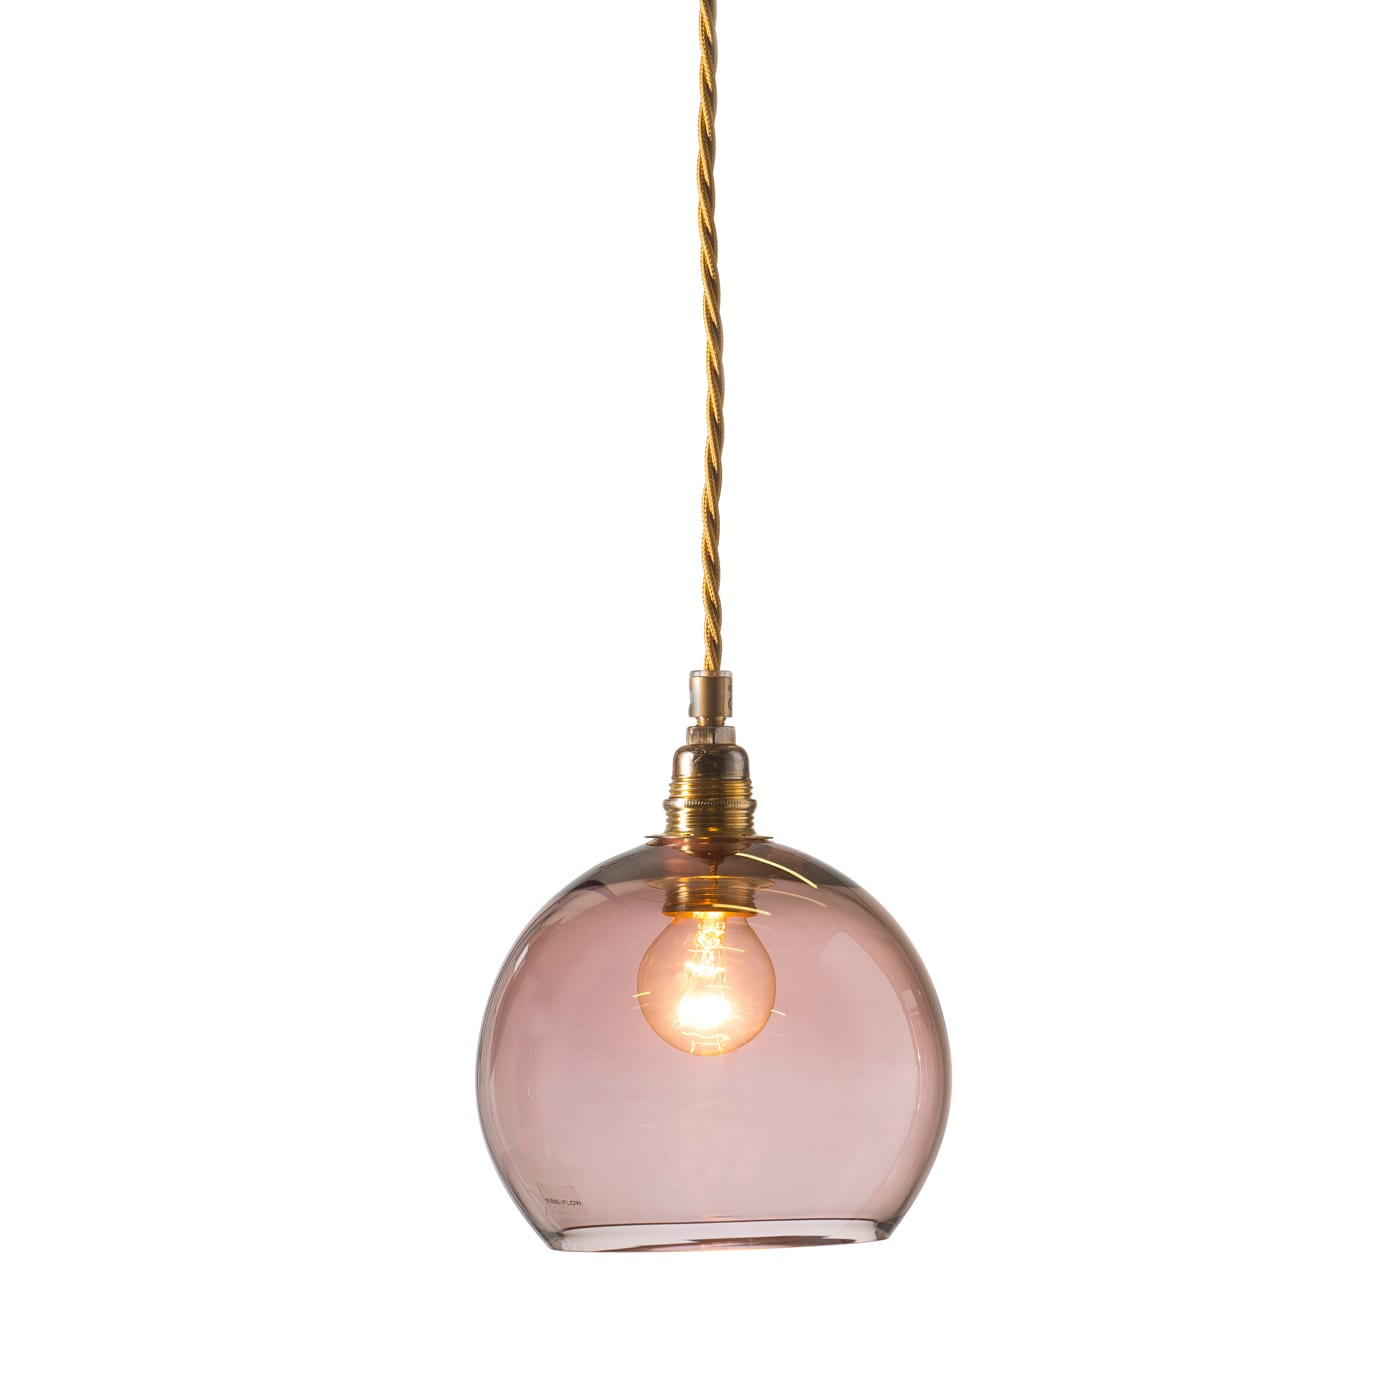 Rowan pendant lamp, obsidian, 15cm